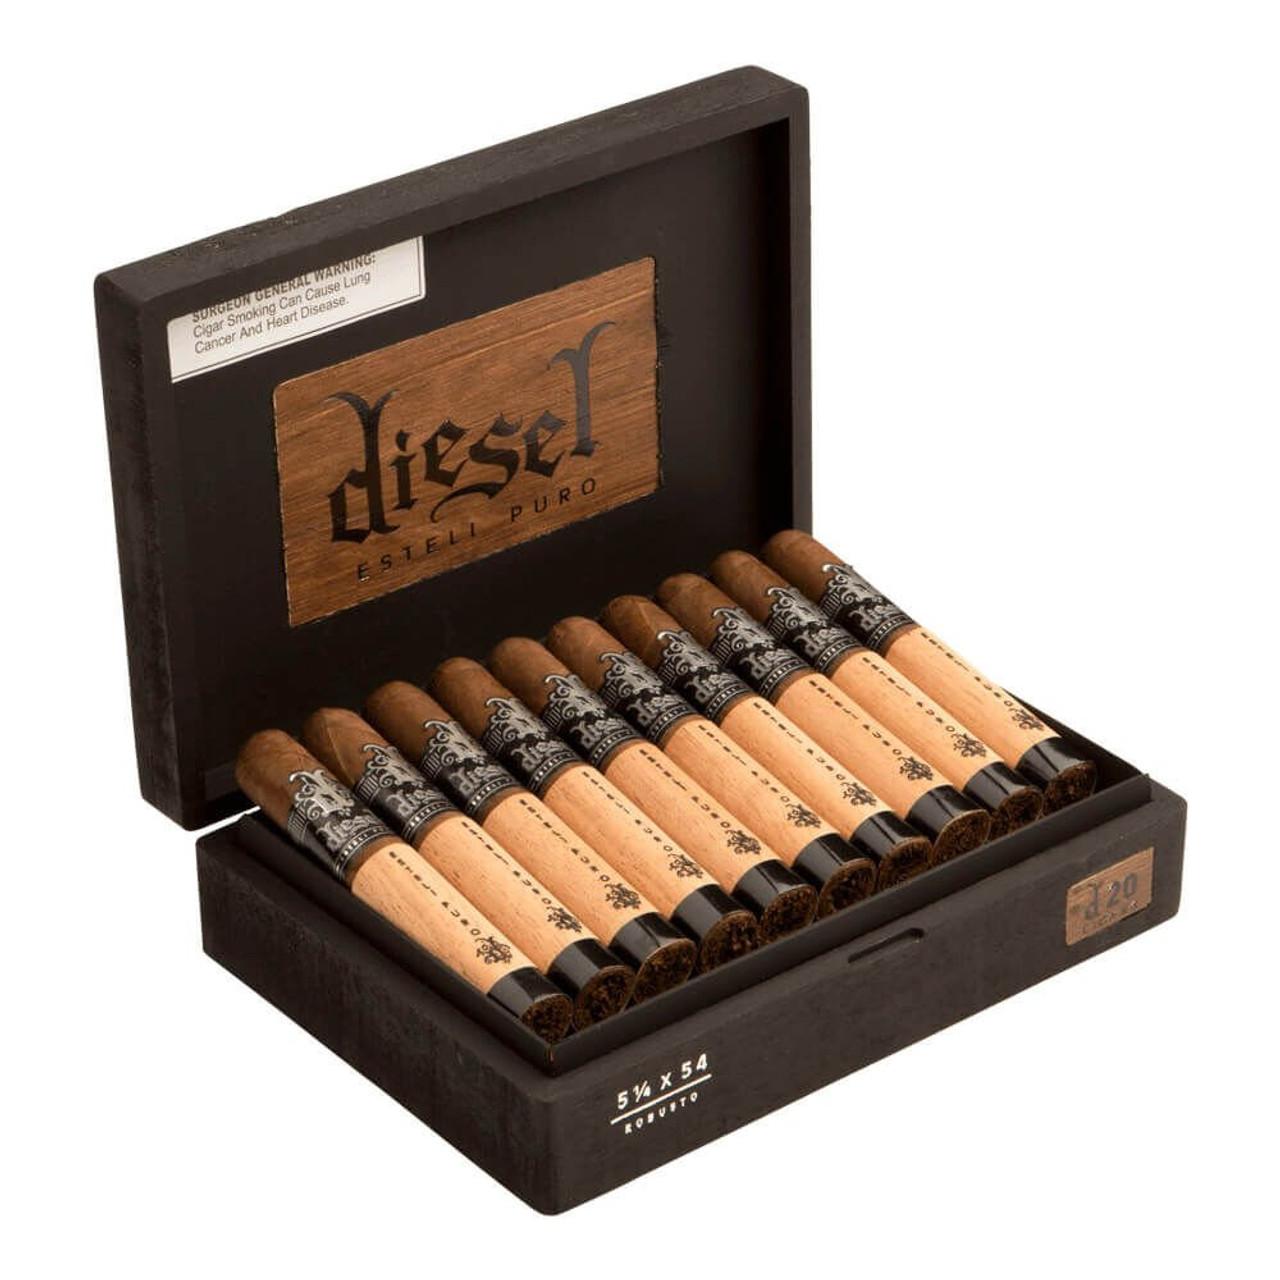 Diesel Esteli Puro Robusto Cigars - 5.25 x 54 (Box of 20)